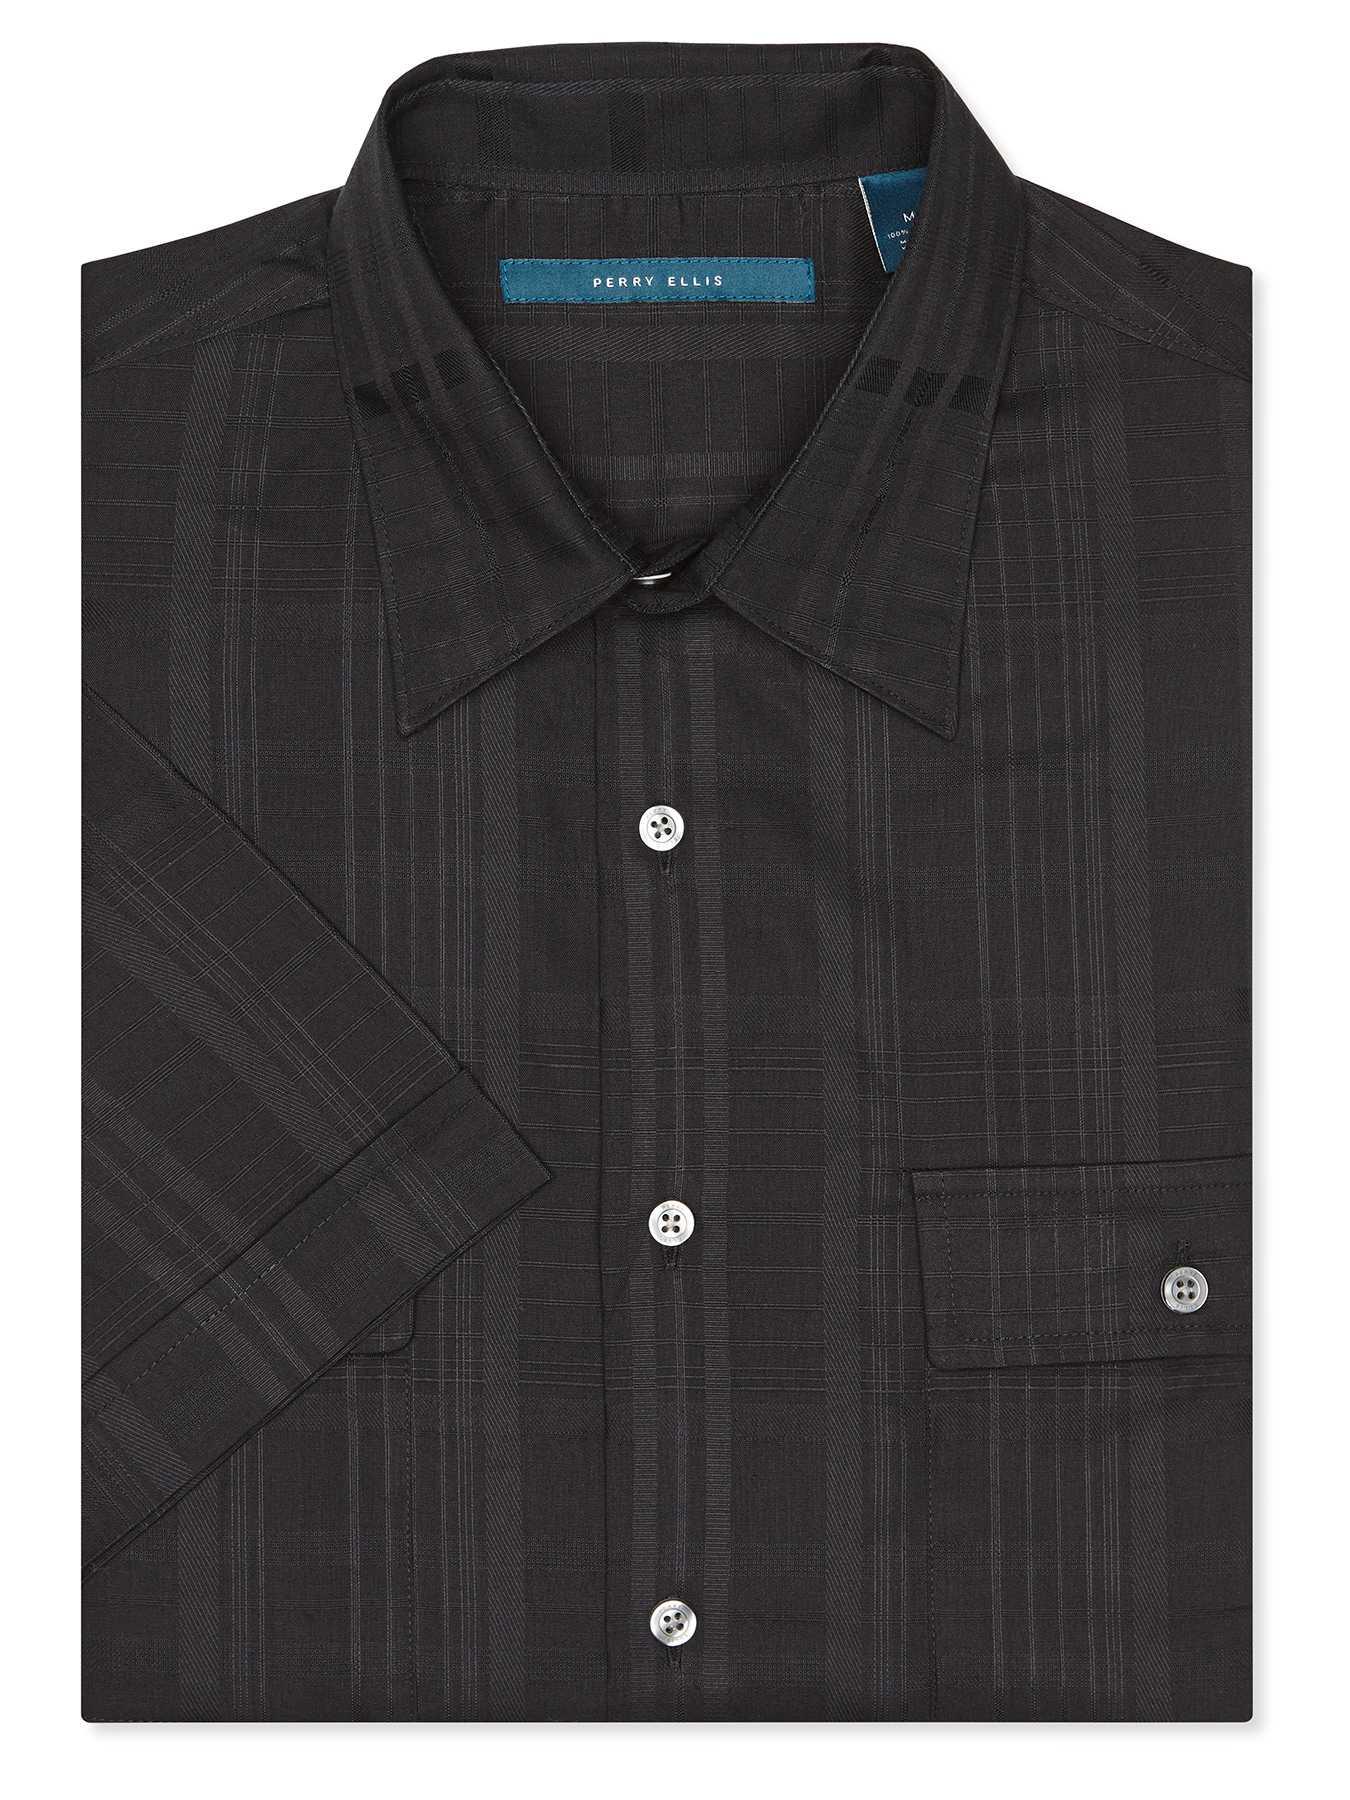 Perry Ellis Short Sleeve Solid Sateen Shirt